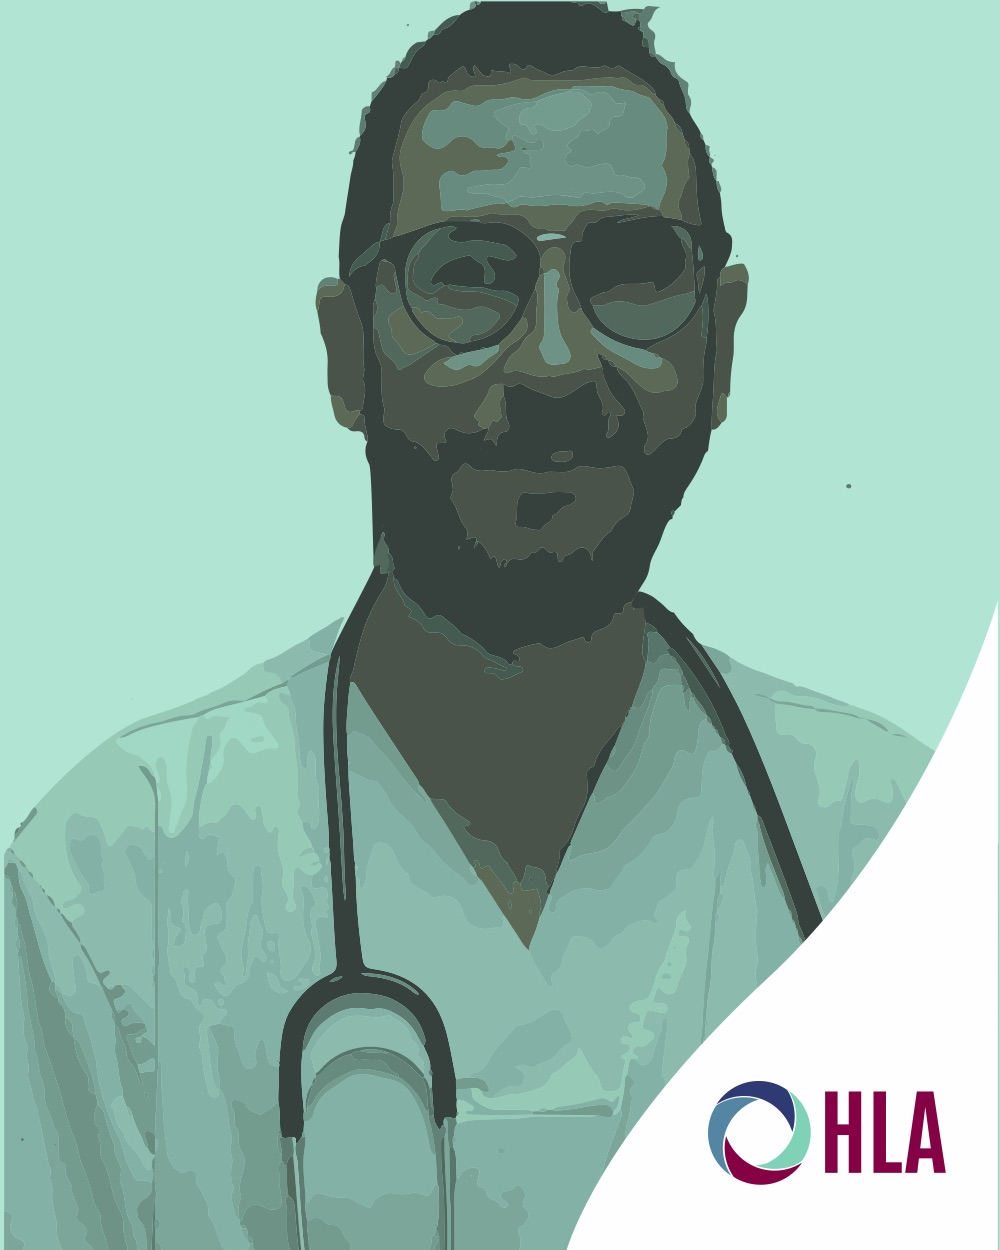 Dr. Javier Perona